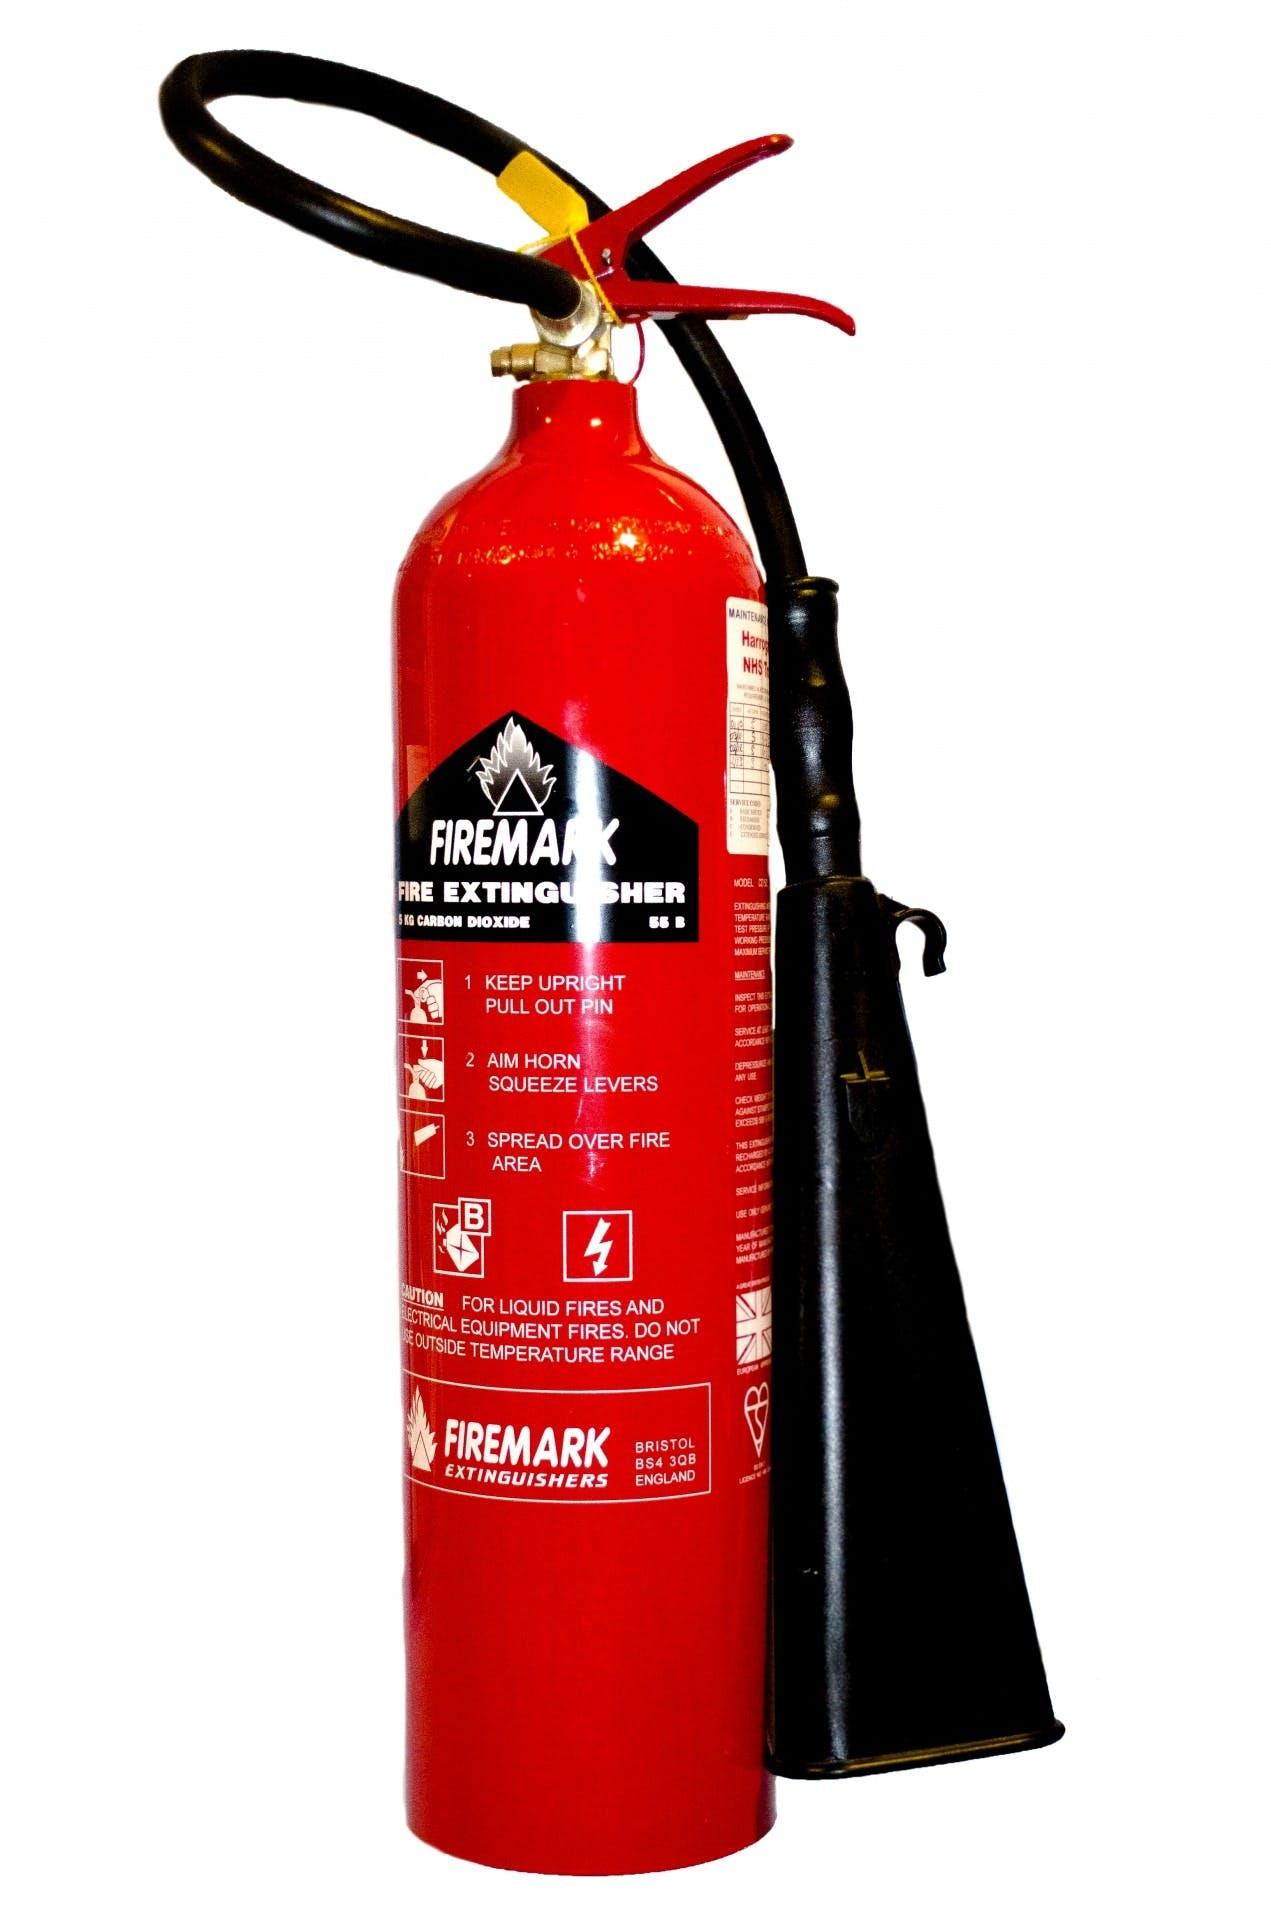 Free stock photo of fire, hot, emergency, alarm